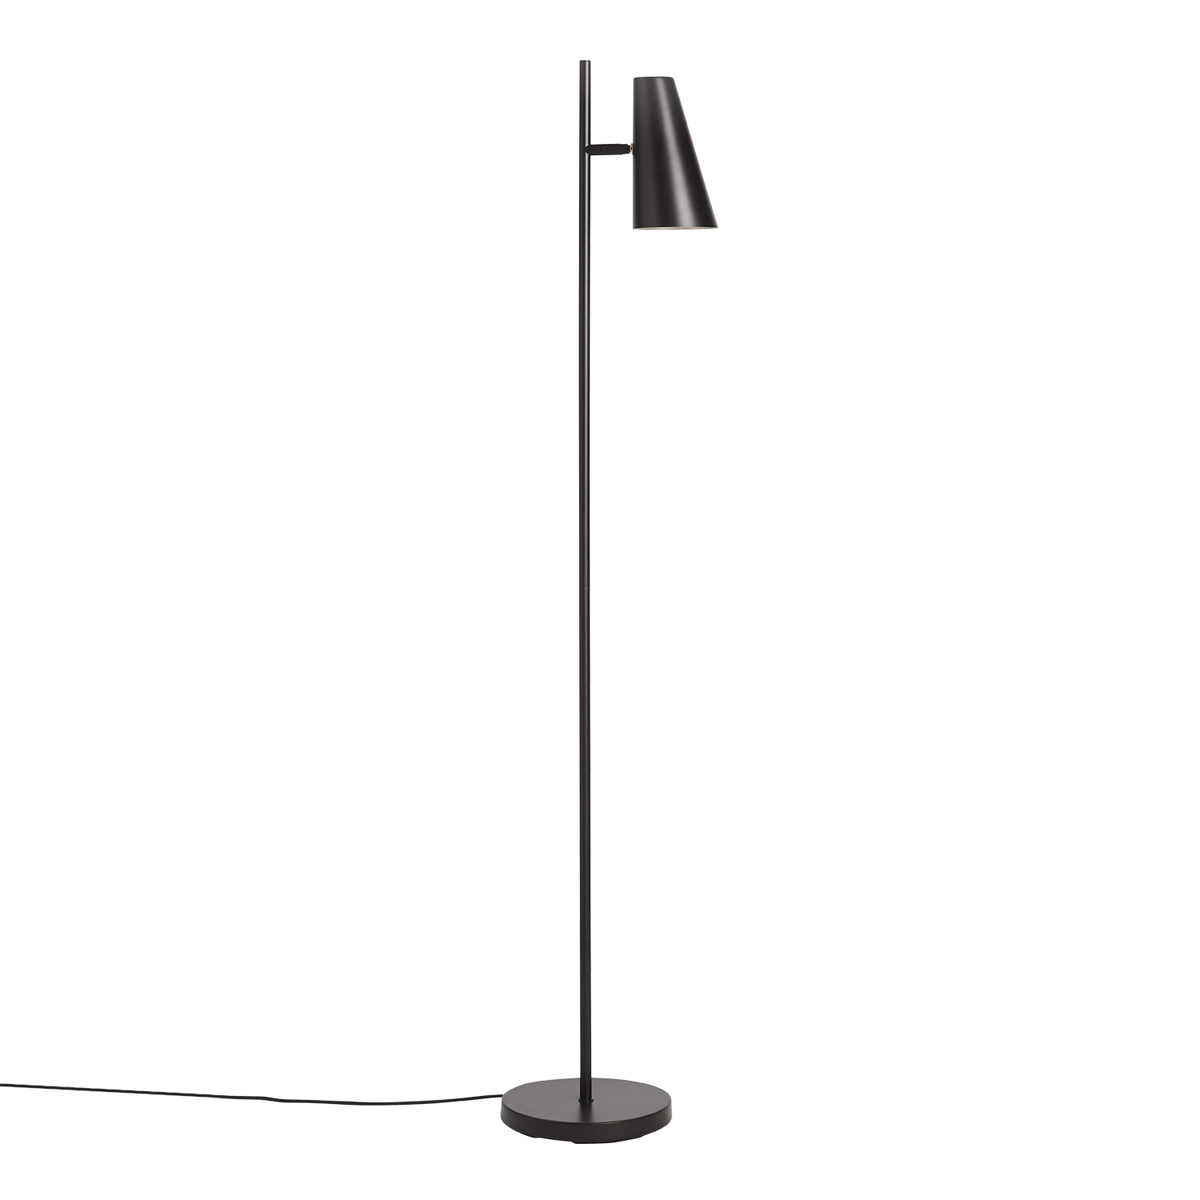 Woud Cono Floor Lamp, Black